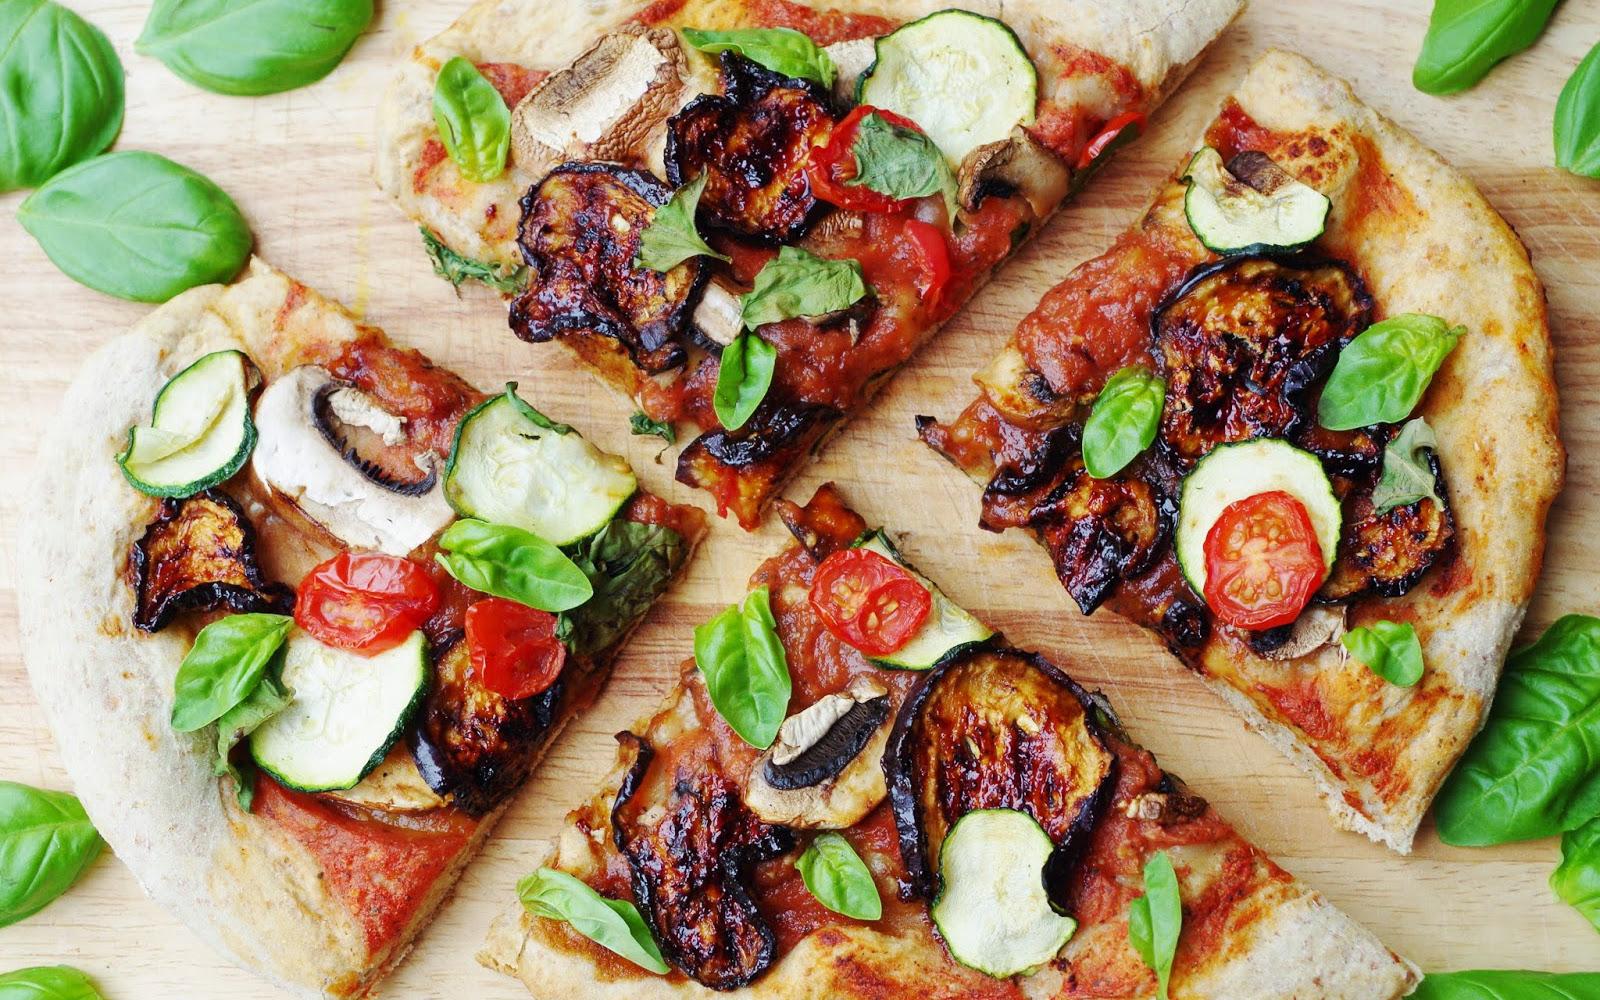 BBQ Eggplant Pizza